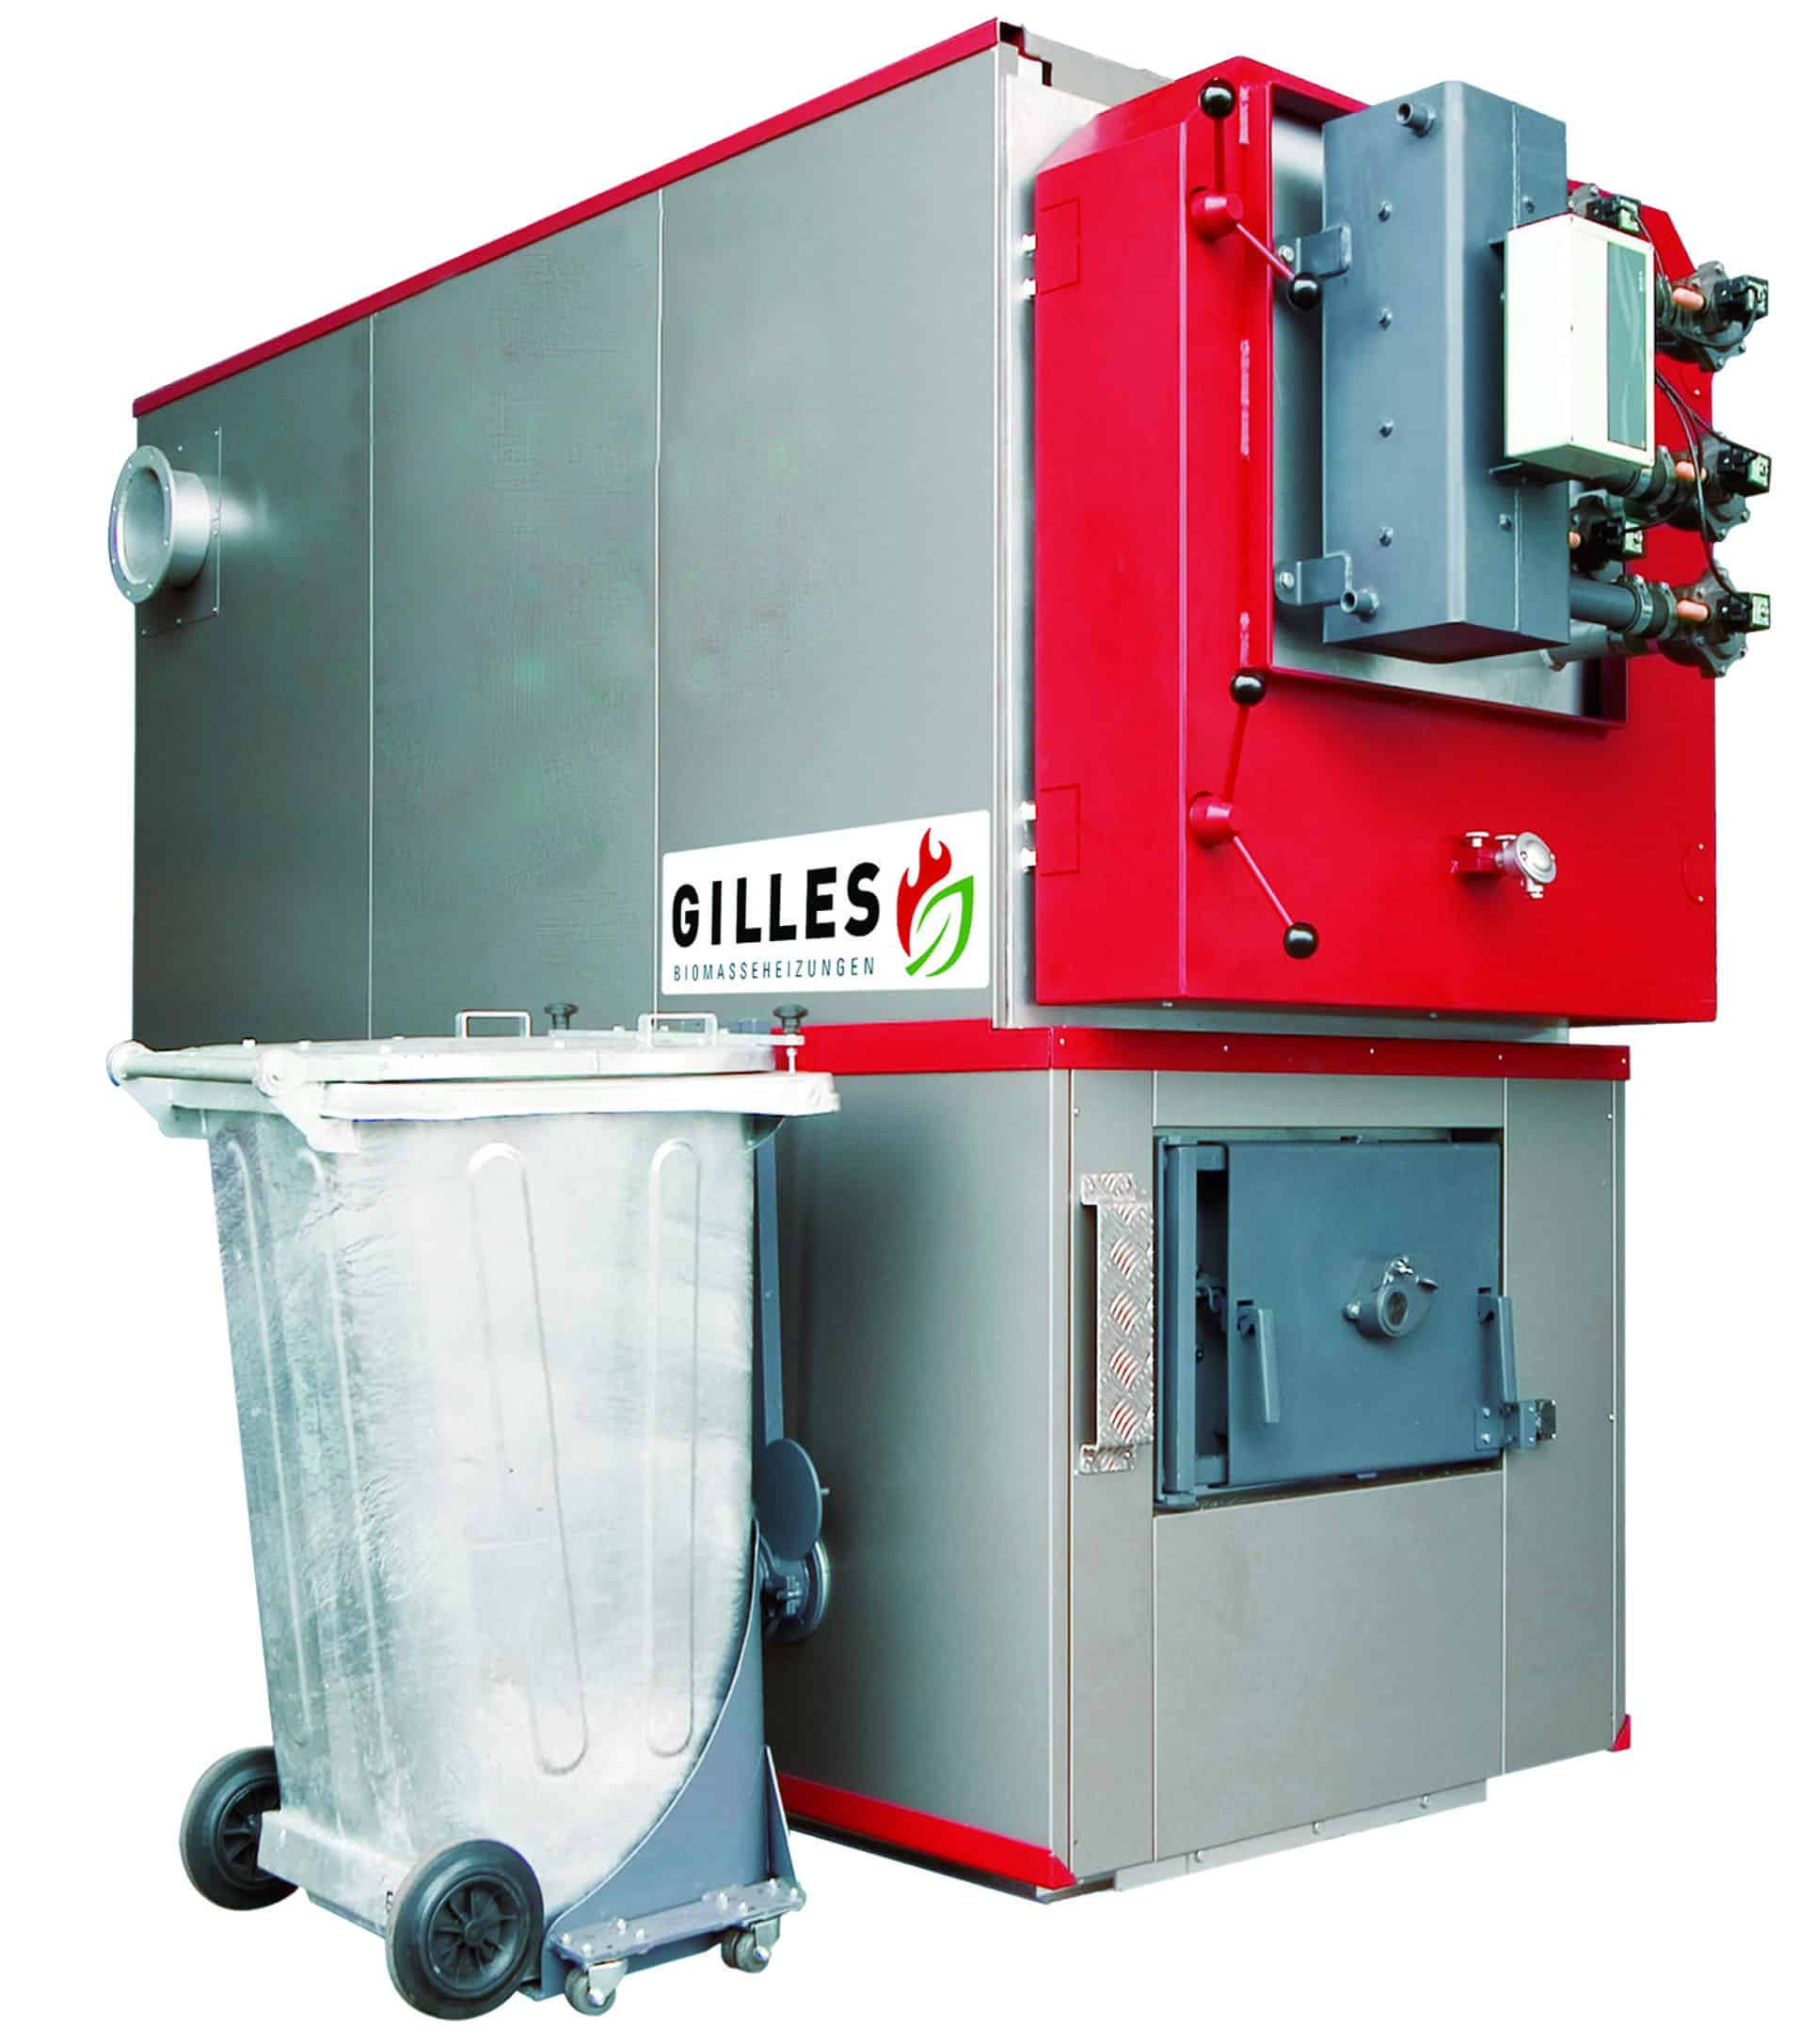 Glles Industrial Boiler